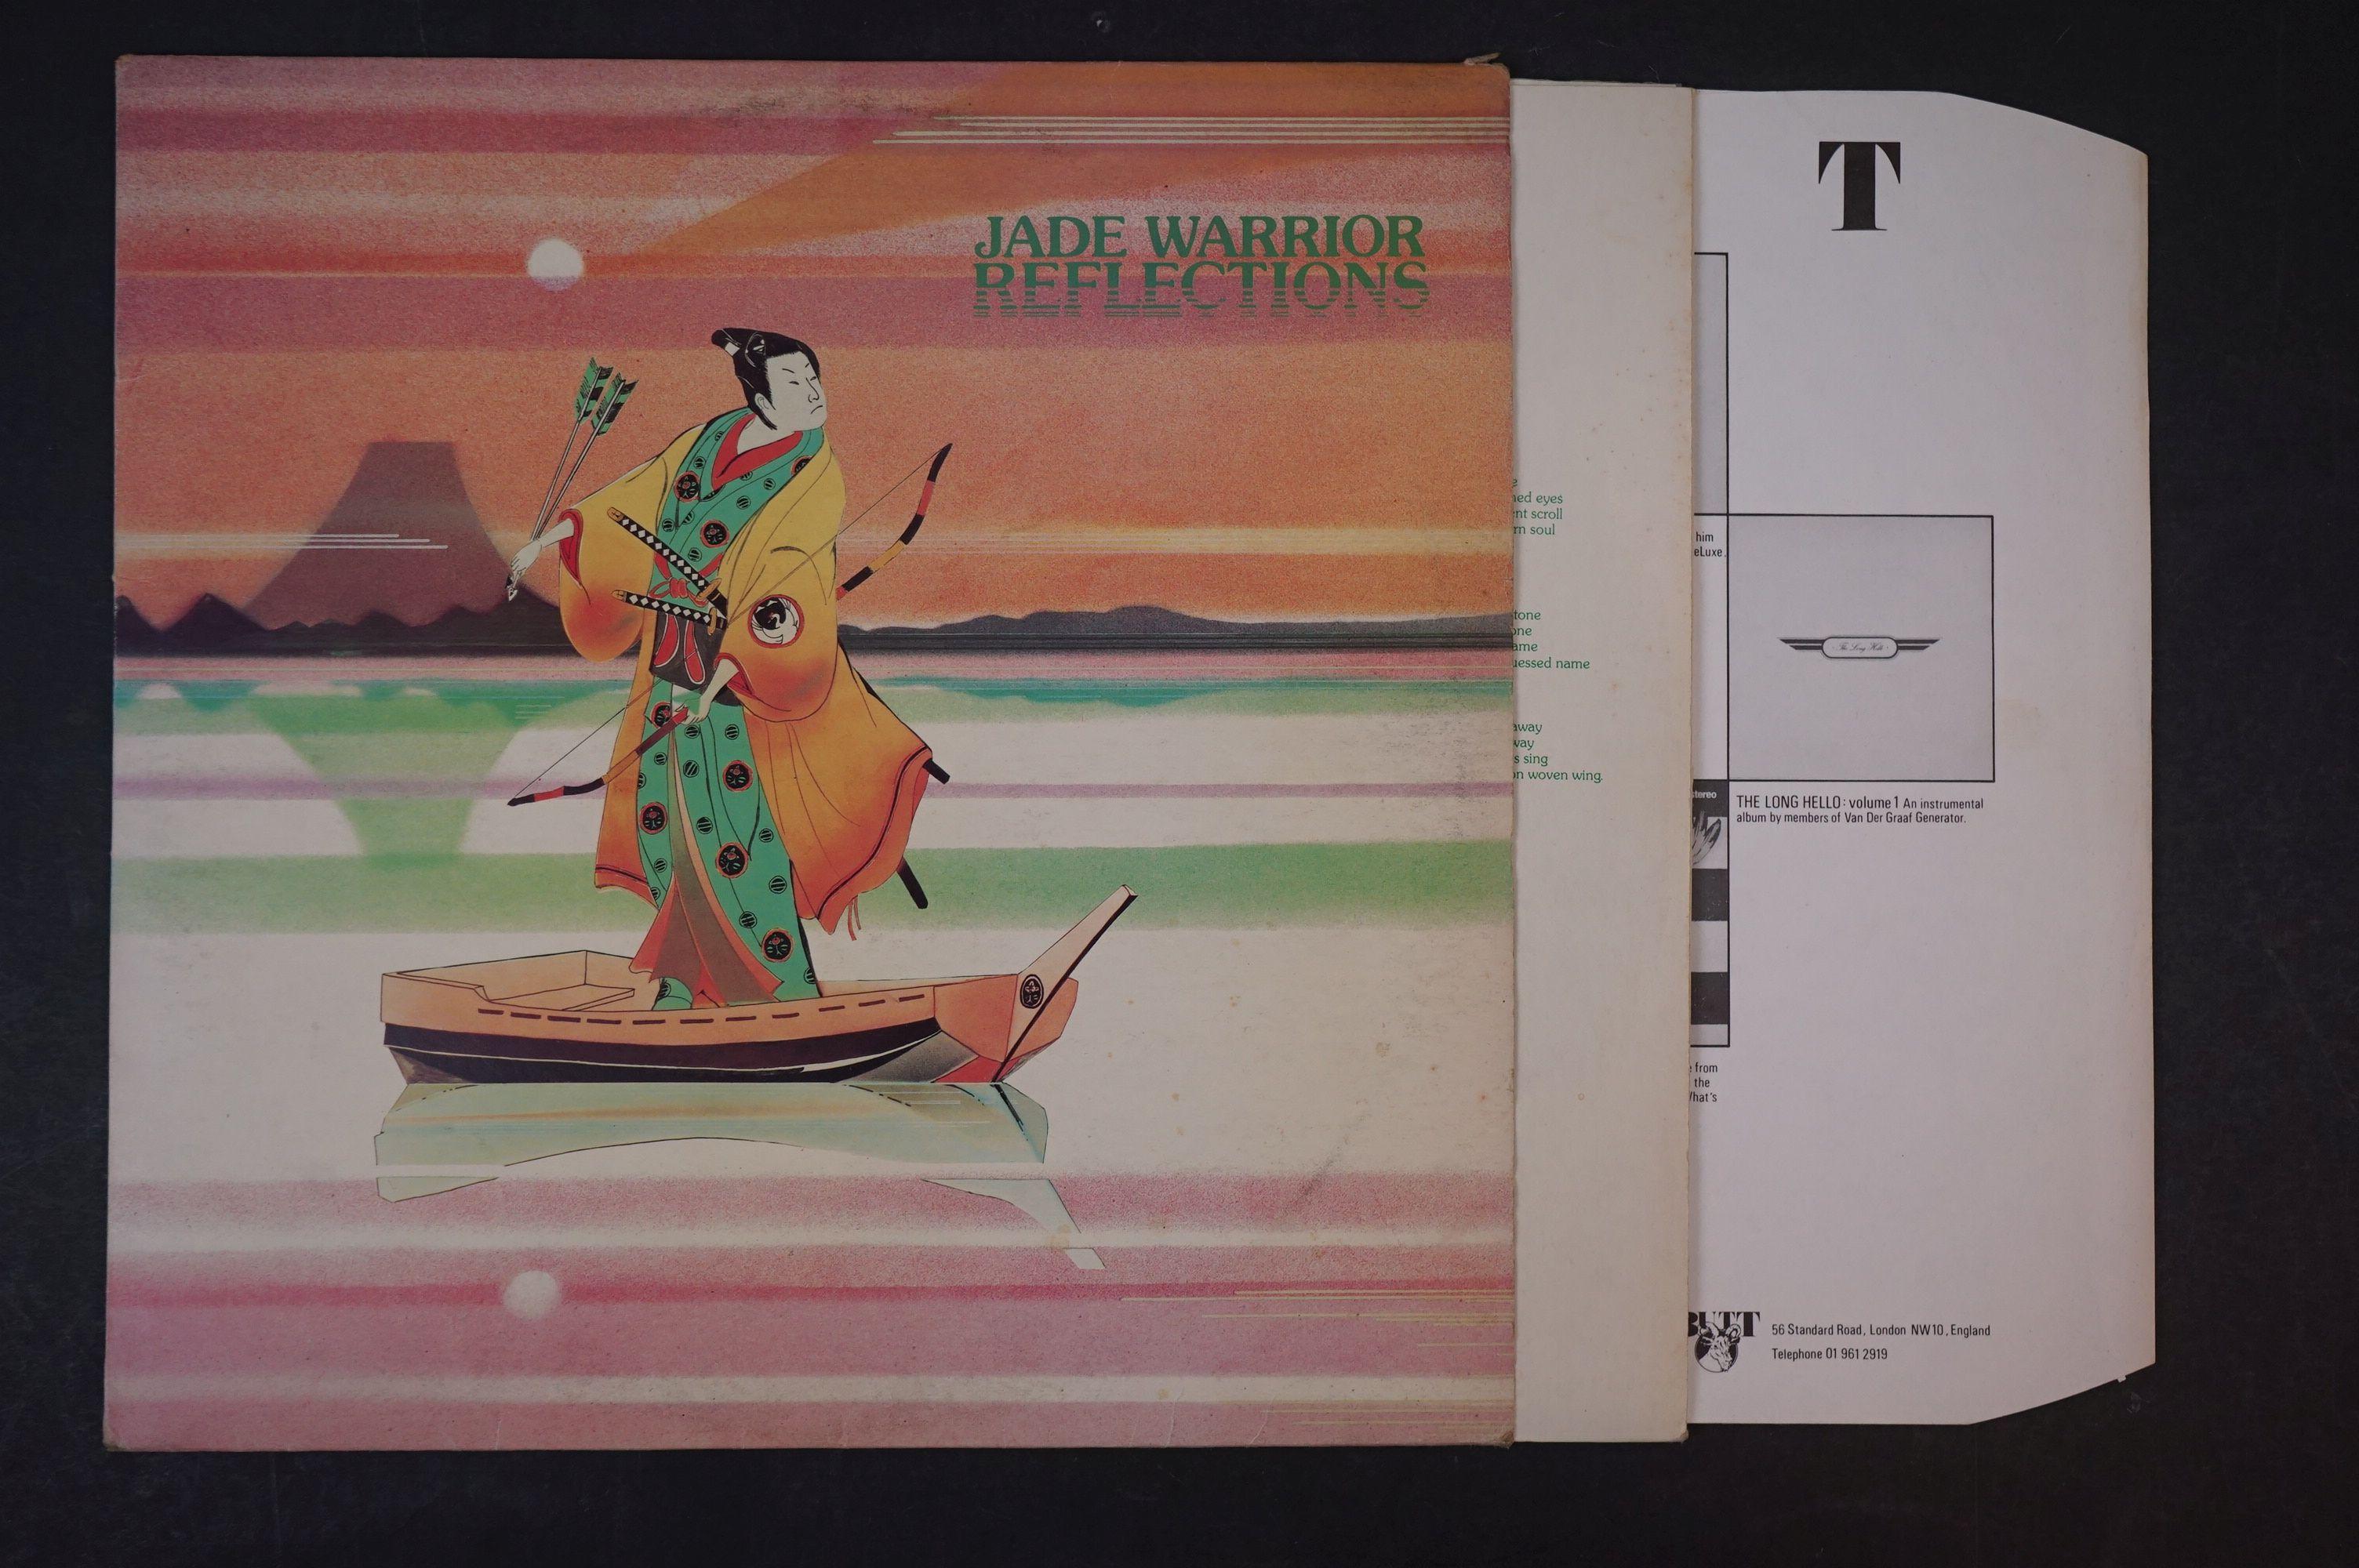 Vinyl - Four Jade Warrior LPs to include Last Autumn Dream LP on Vertigo Deluxe 6360079 gatefold - Image 3 of 9